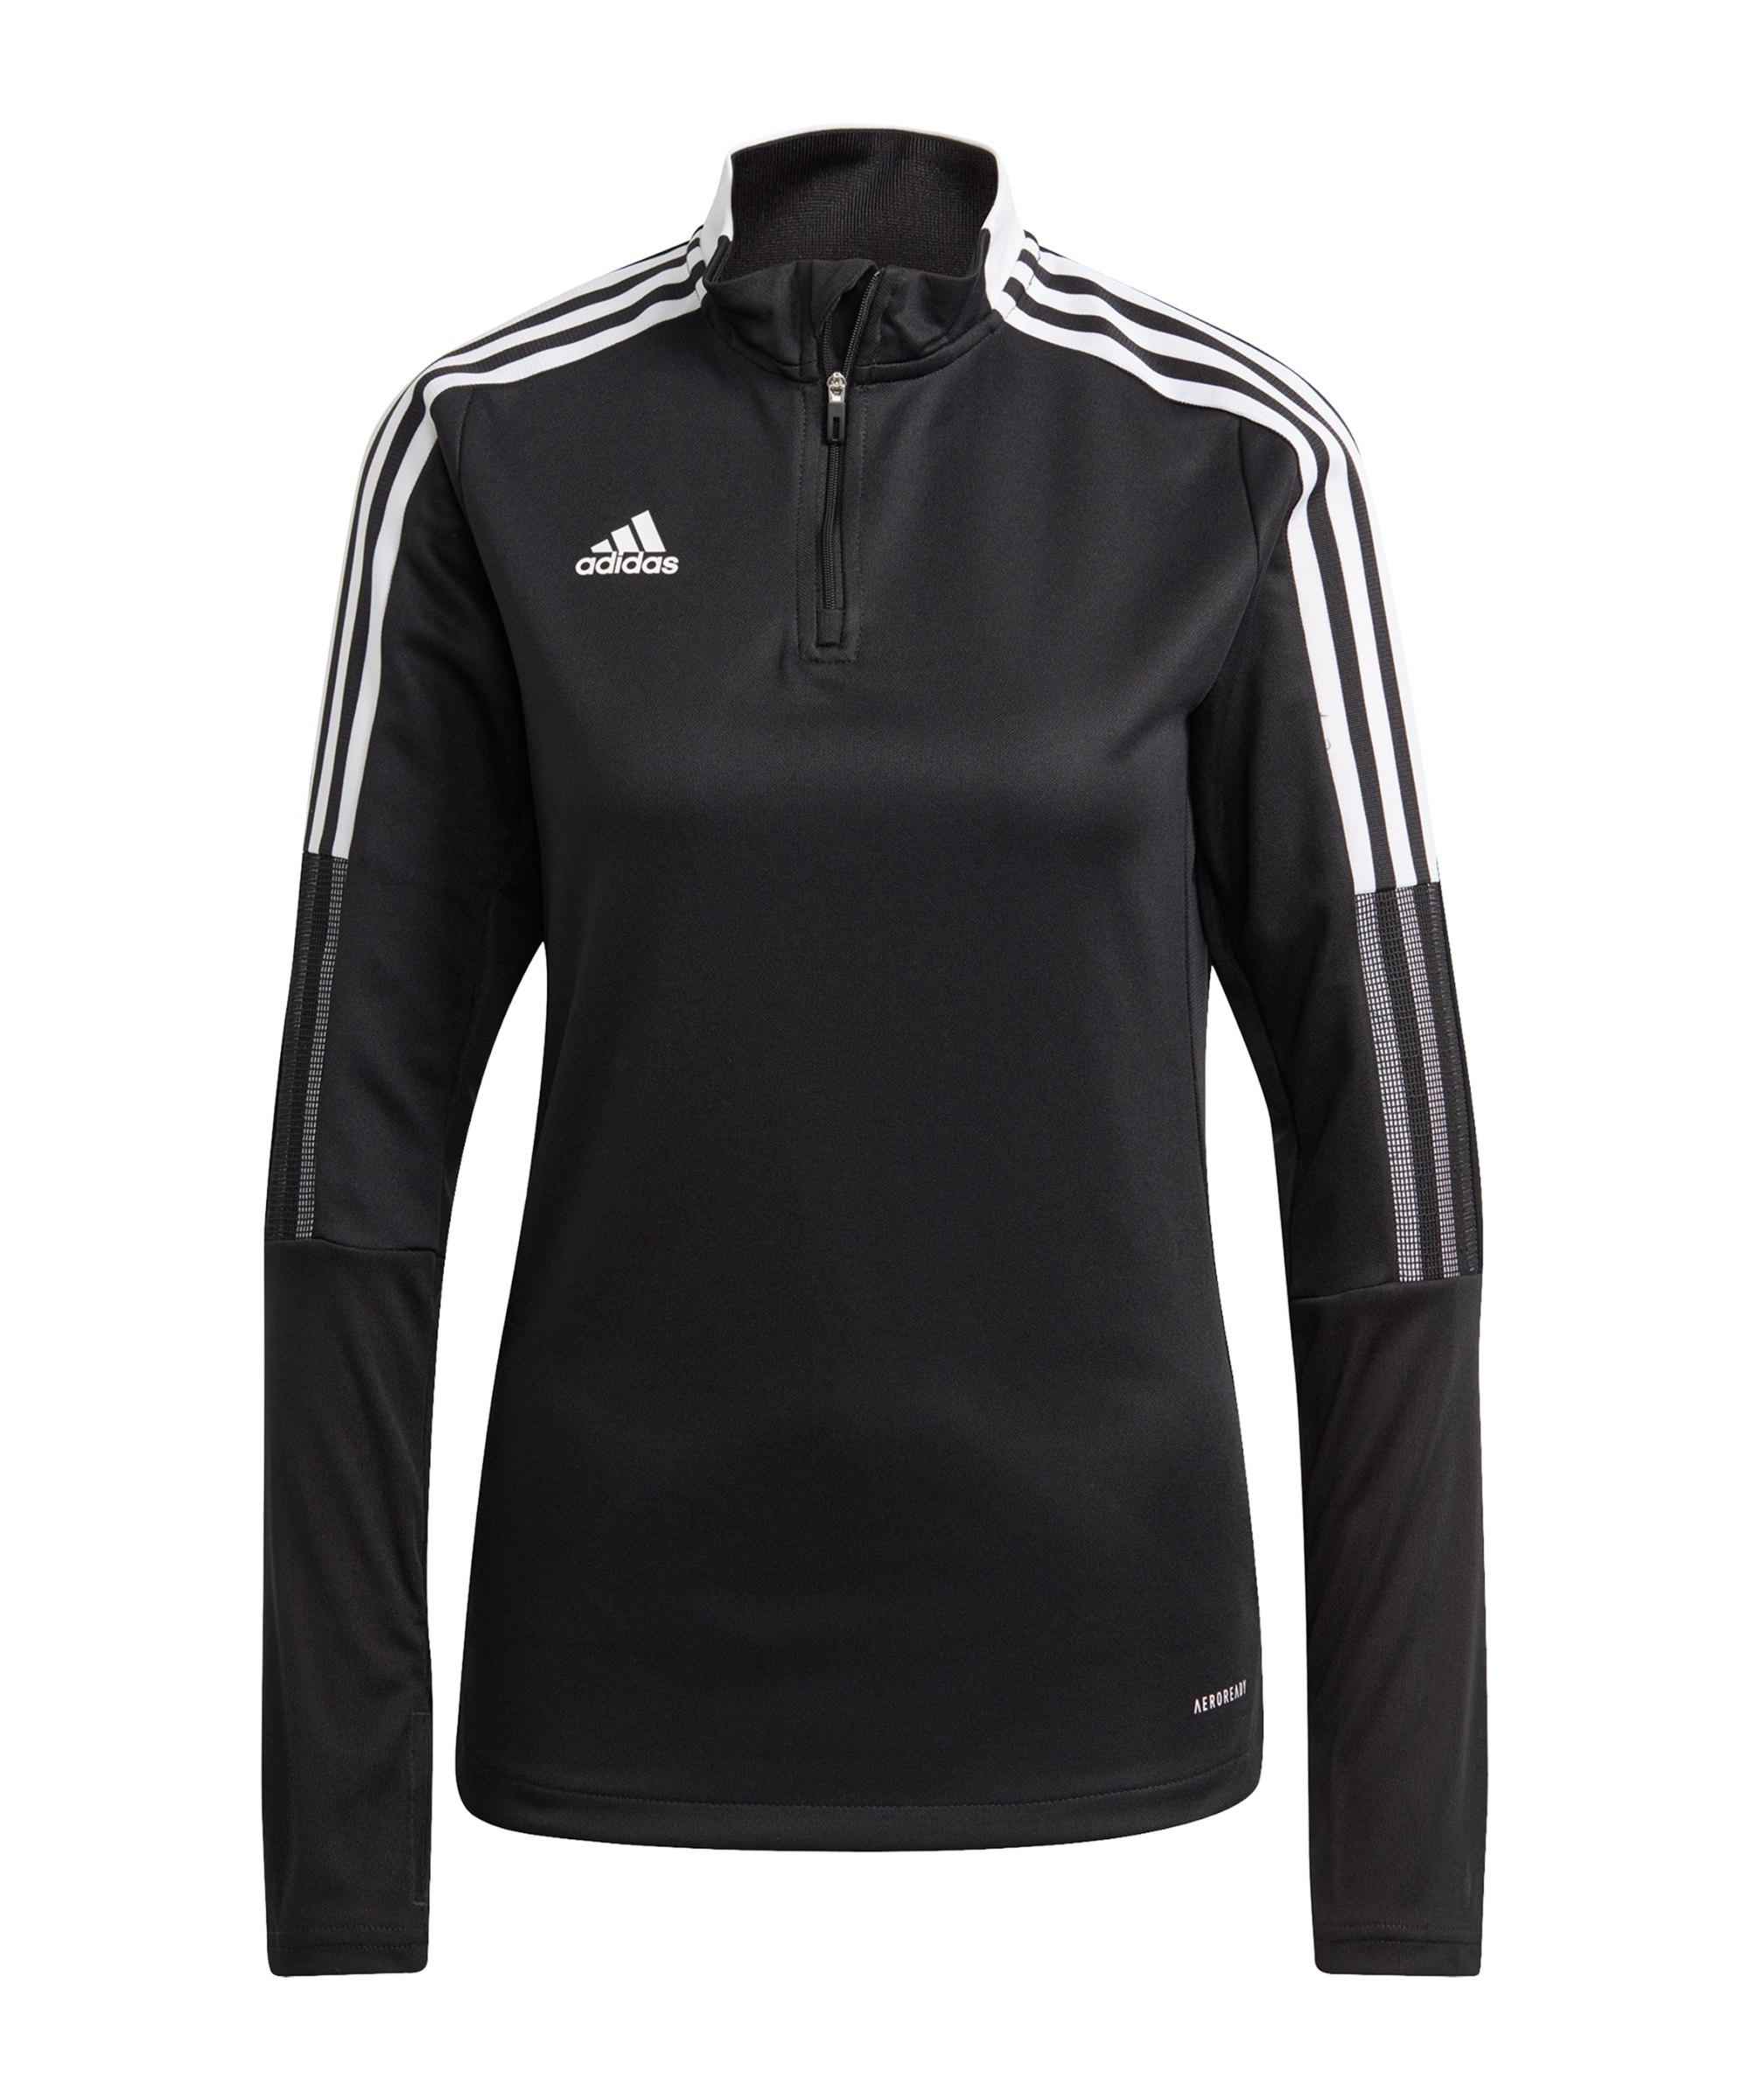 adidas Tiro 21 Trainingstop Damen Schwarz - schwarz